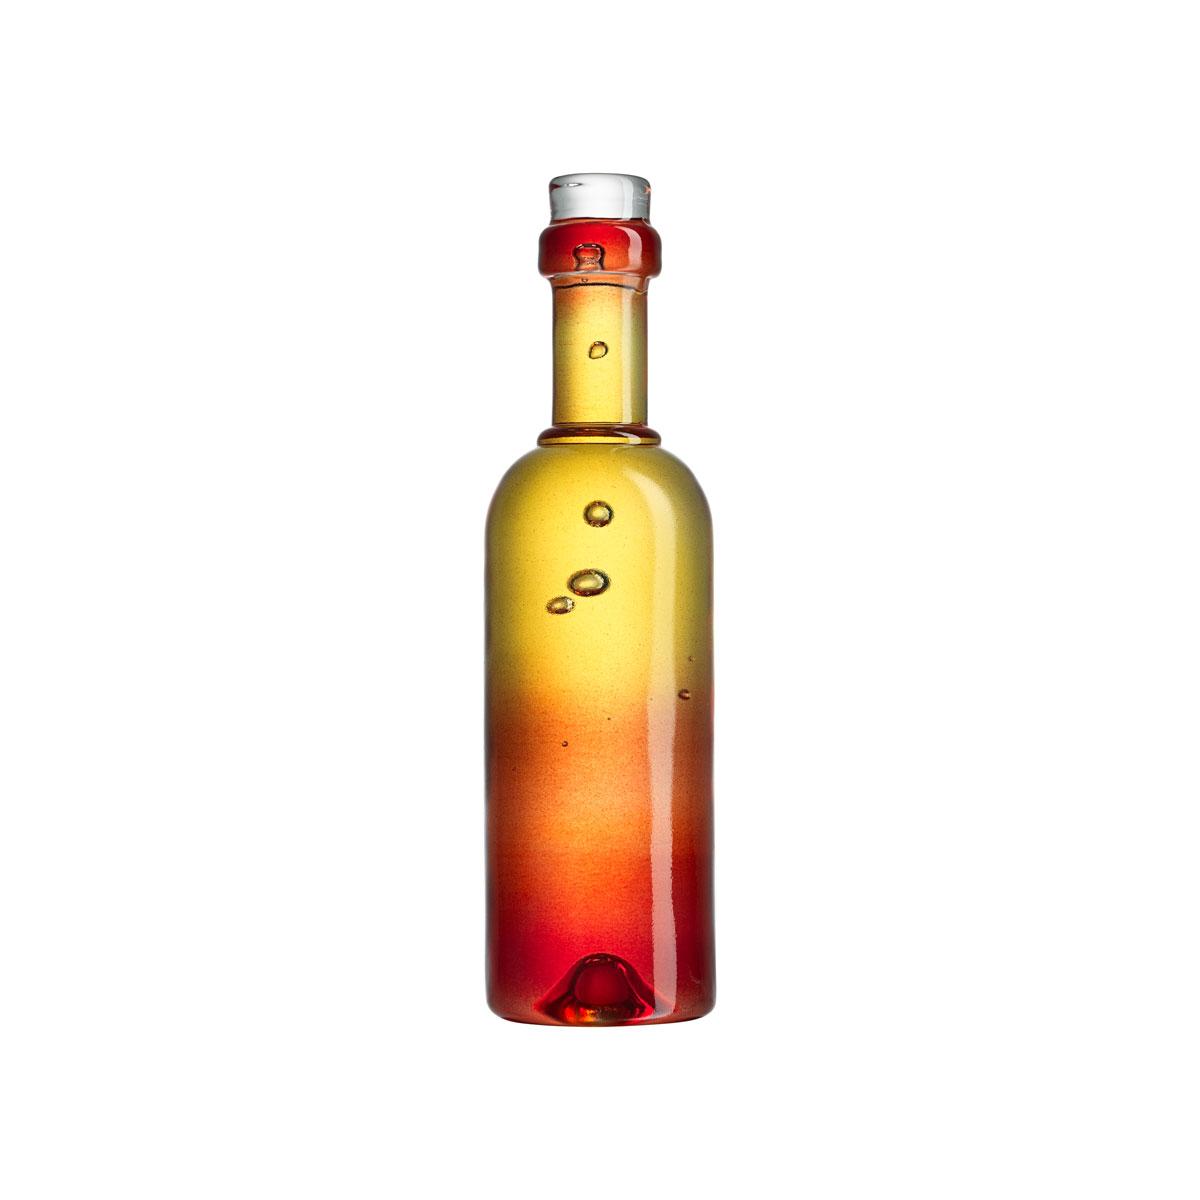 Kosta Boda Celebrate Crystal Wine Bottle, Red